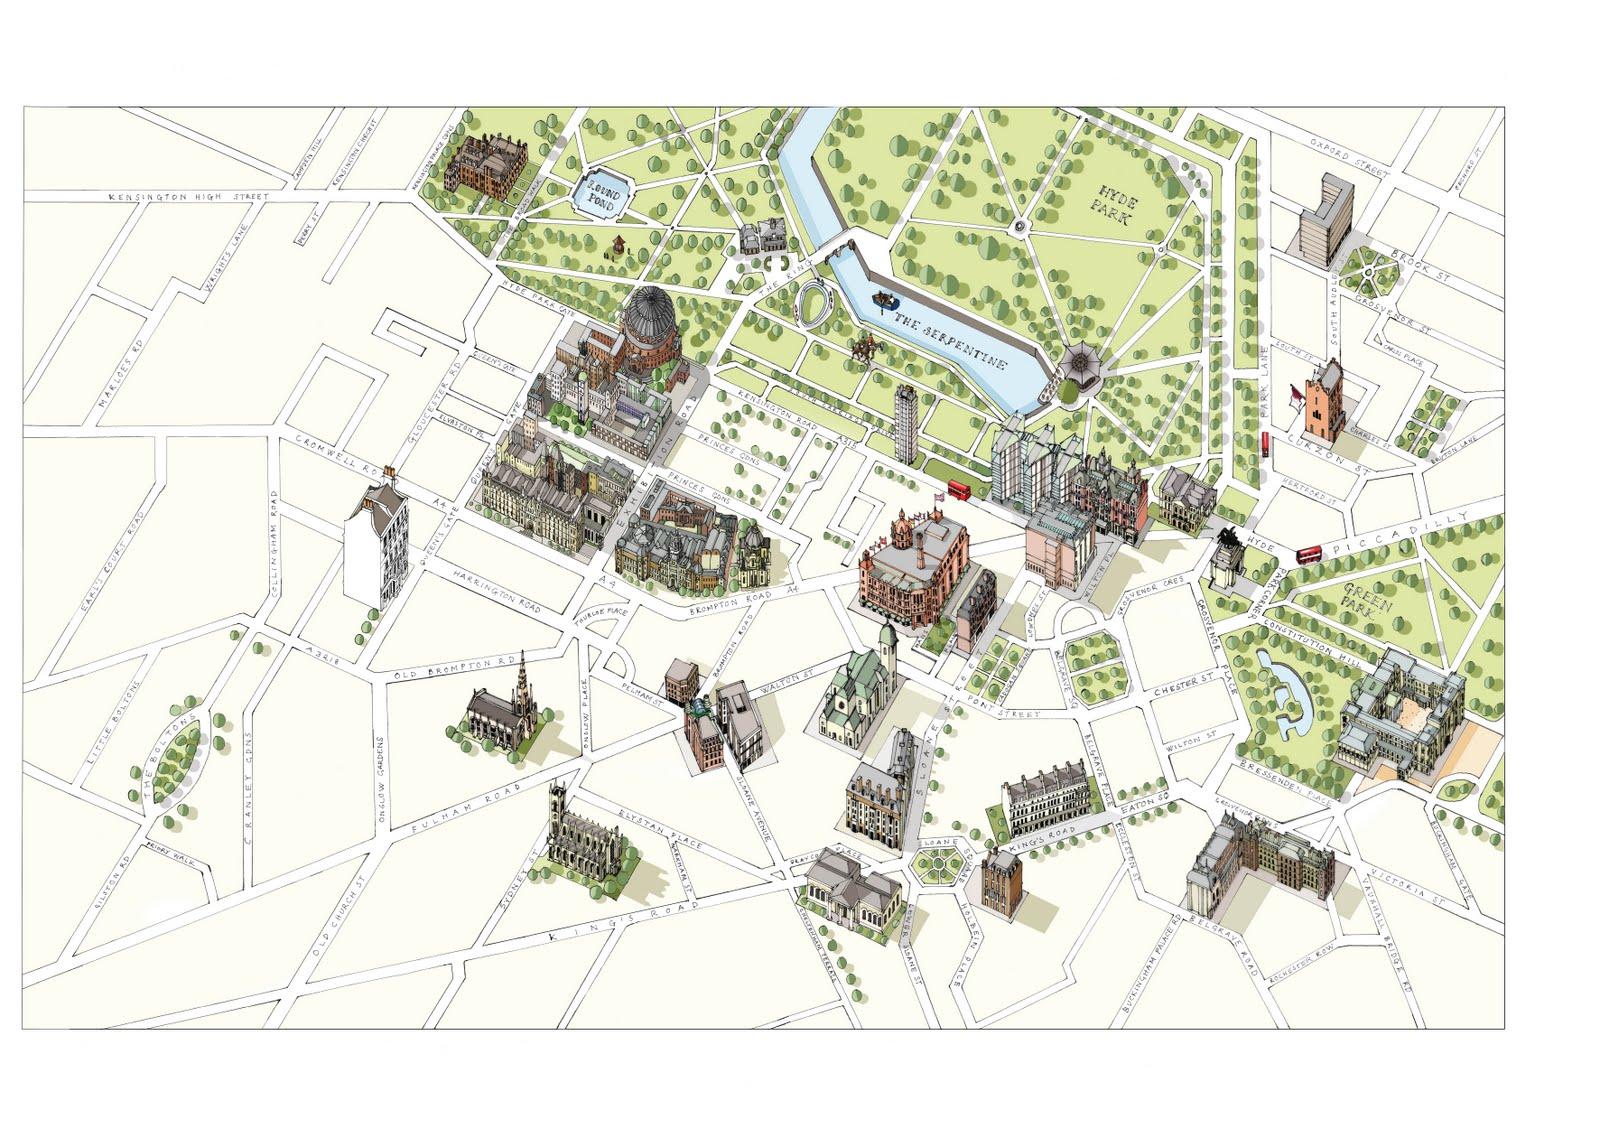 South Kensington London Map.Katherine Baxter Illustrator Illustrated Map Of London